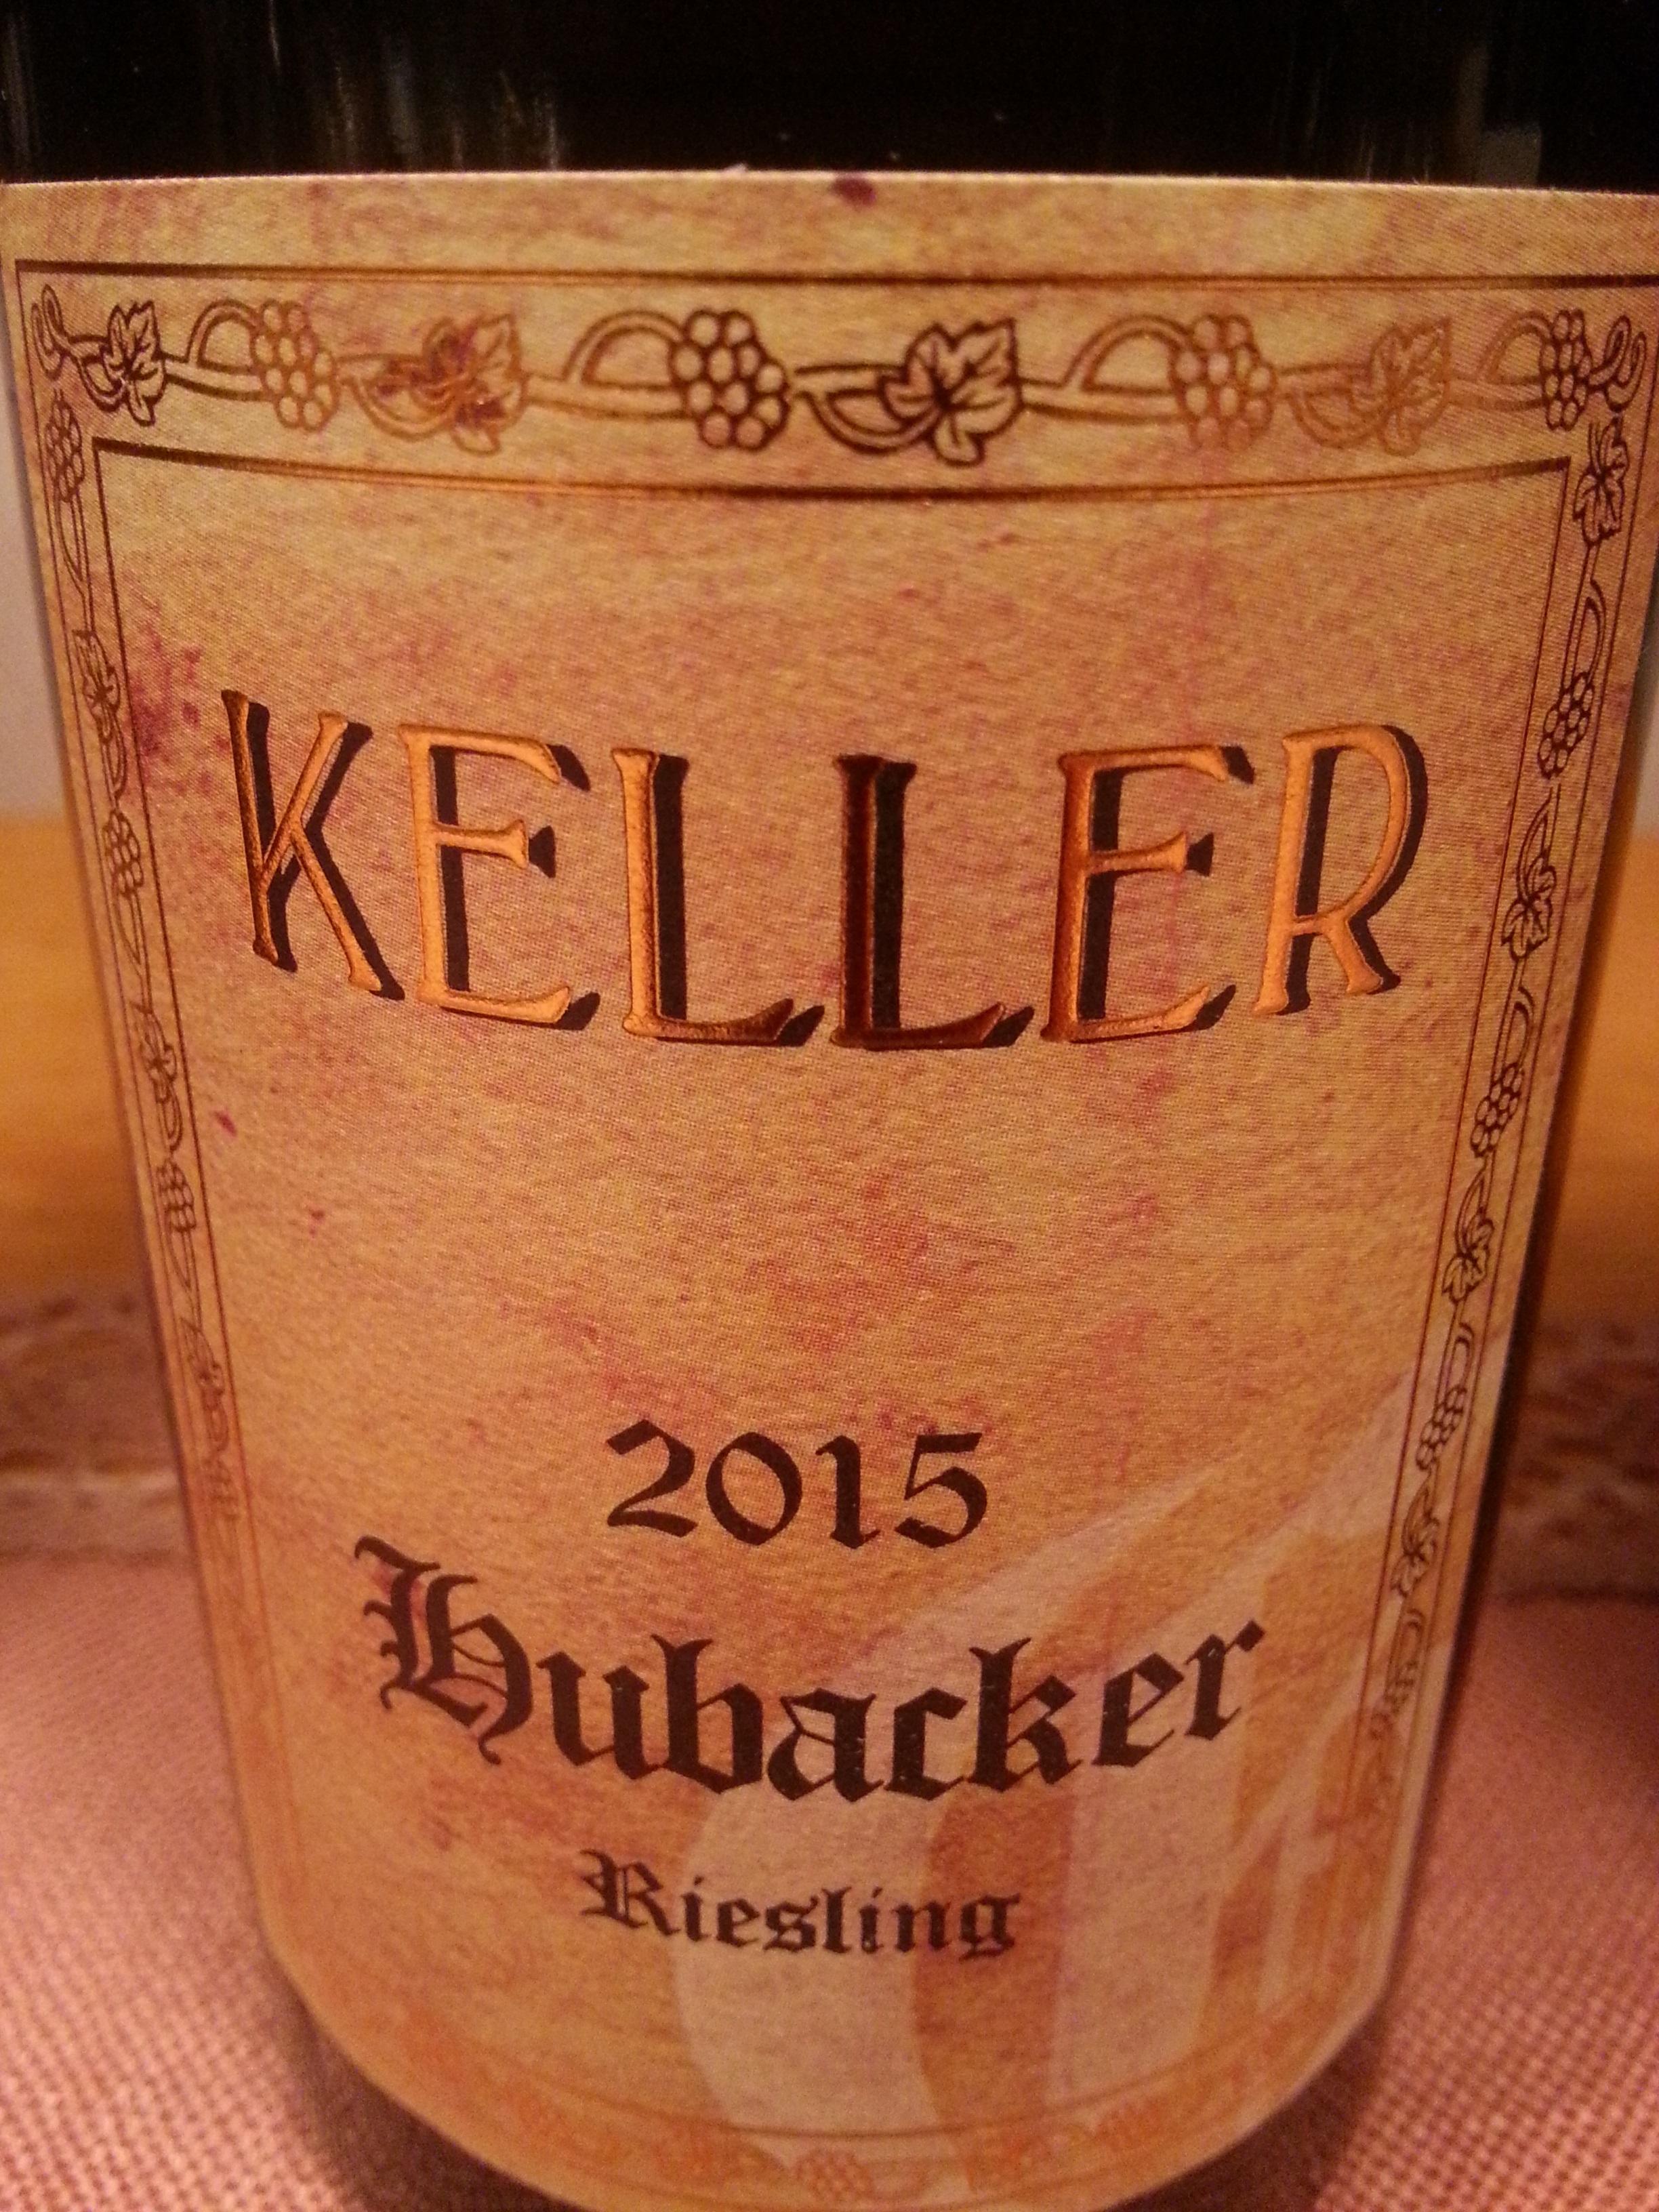 2015 Riesling Hubacker GG | Keller